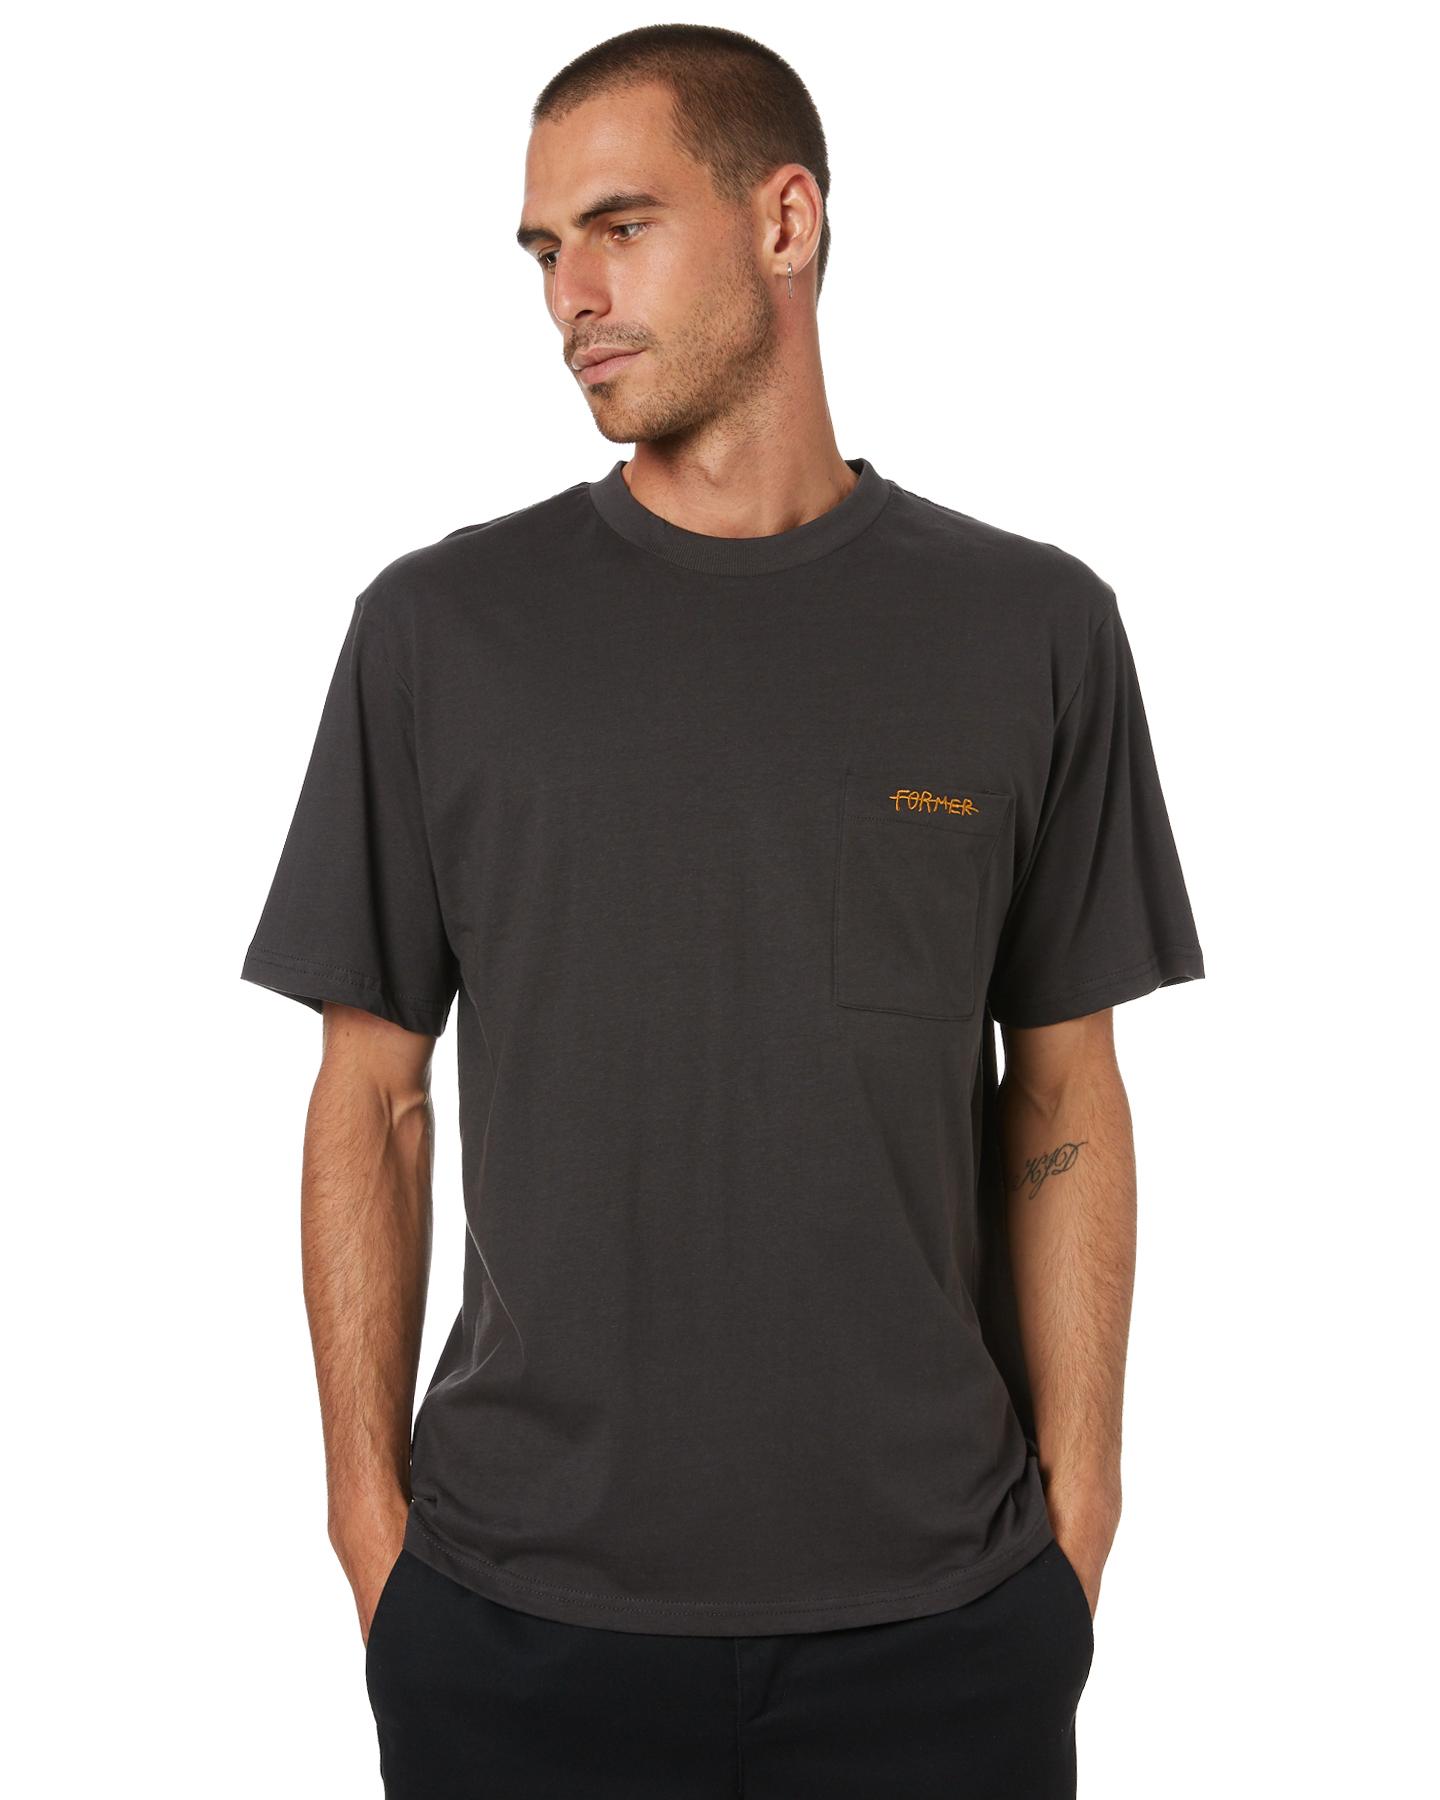 Former Pocket Script Mens T-Shirt Aged Black